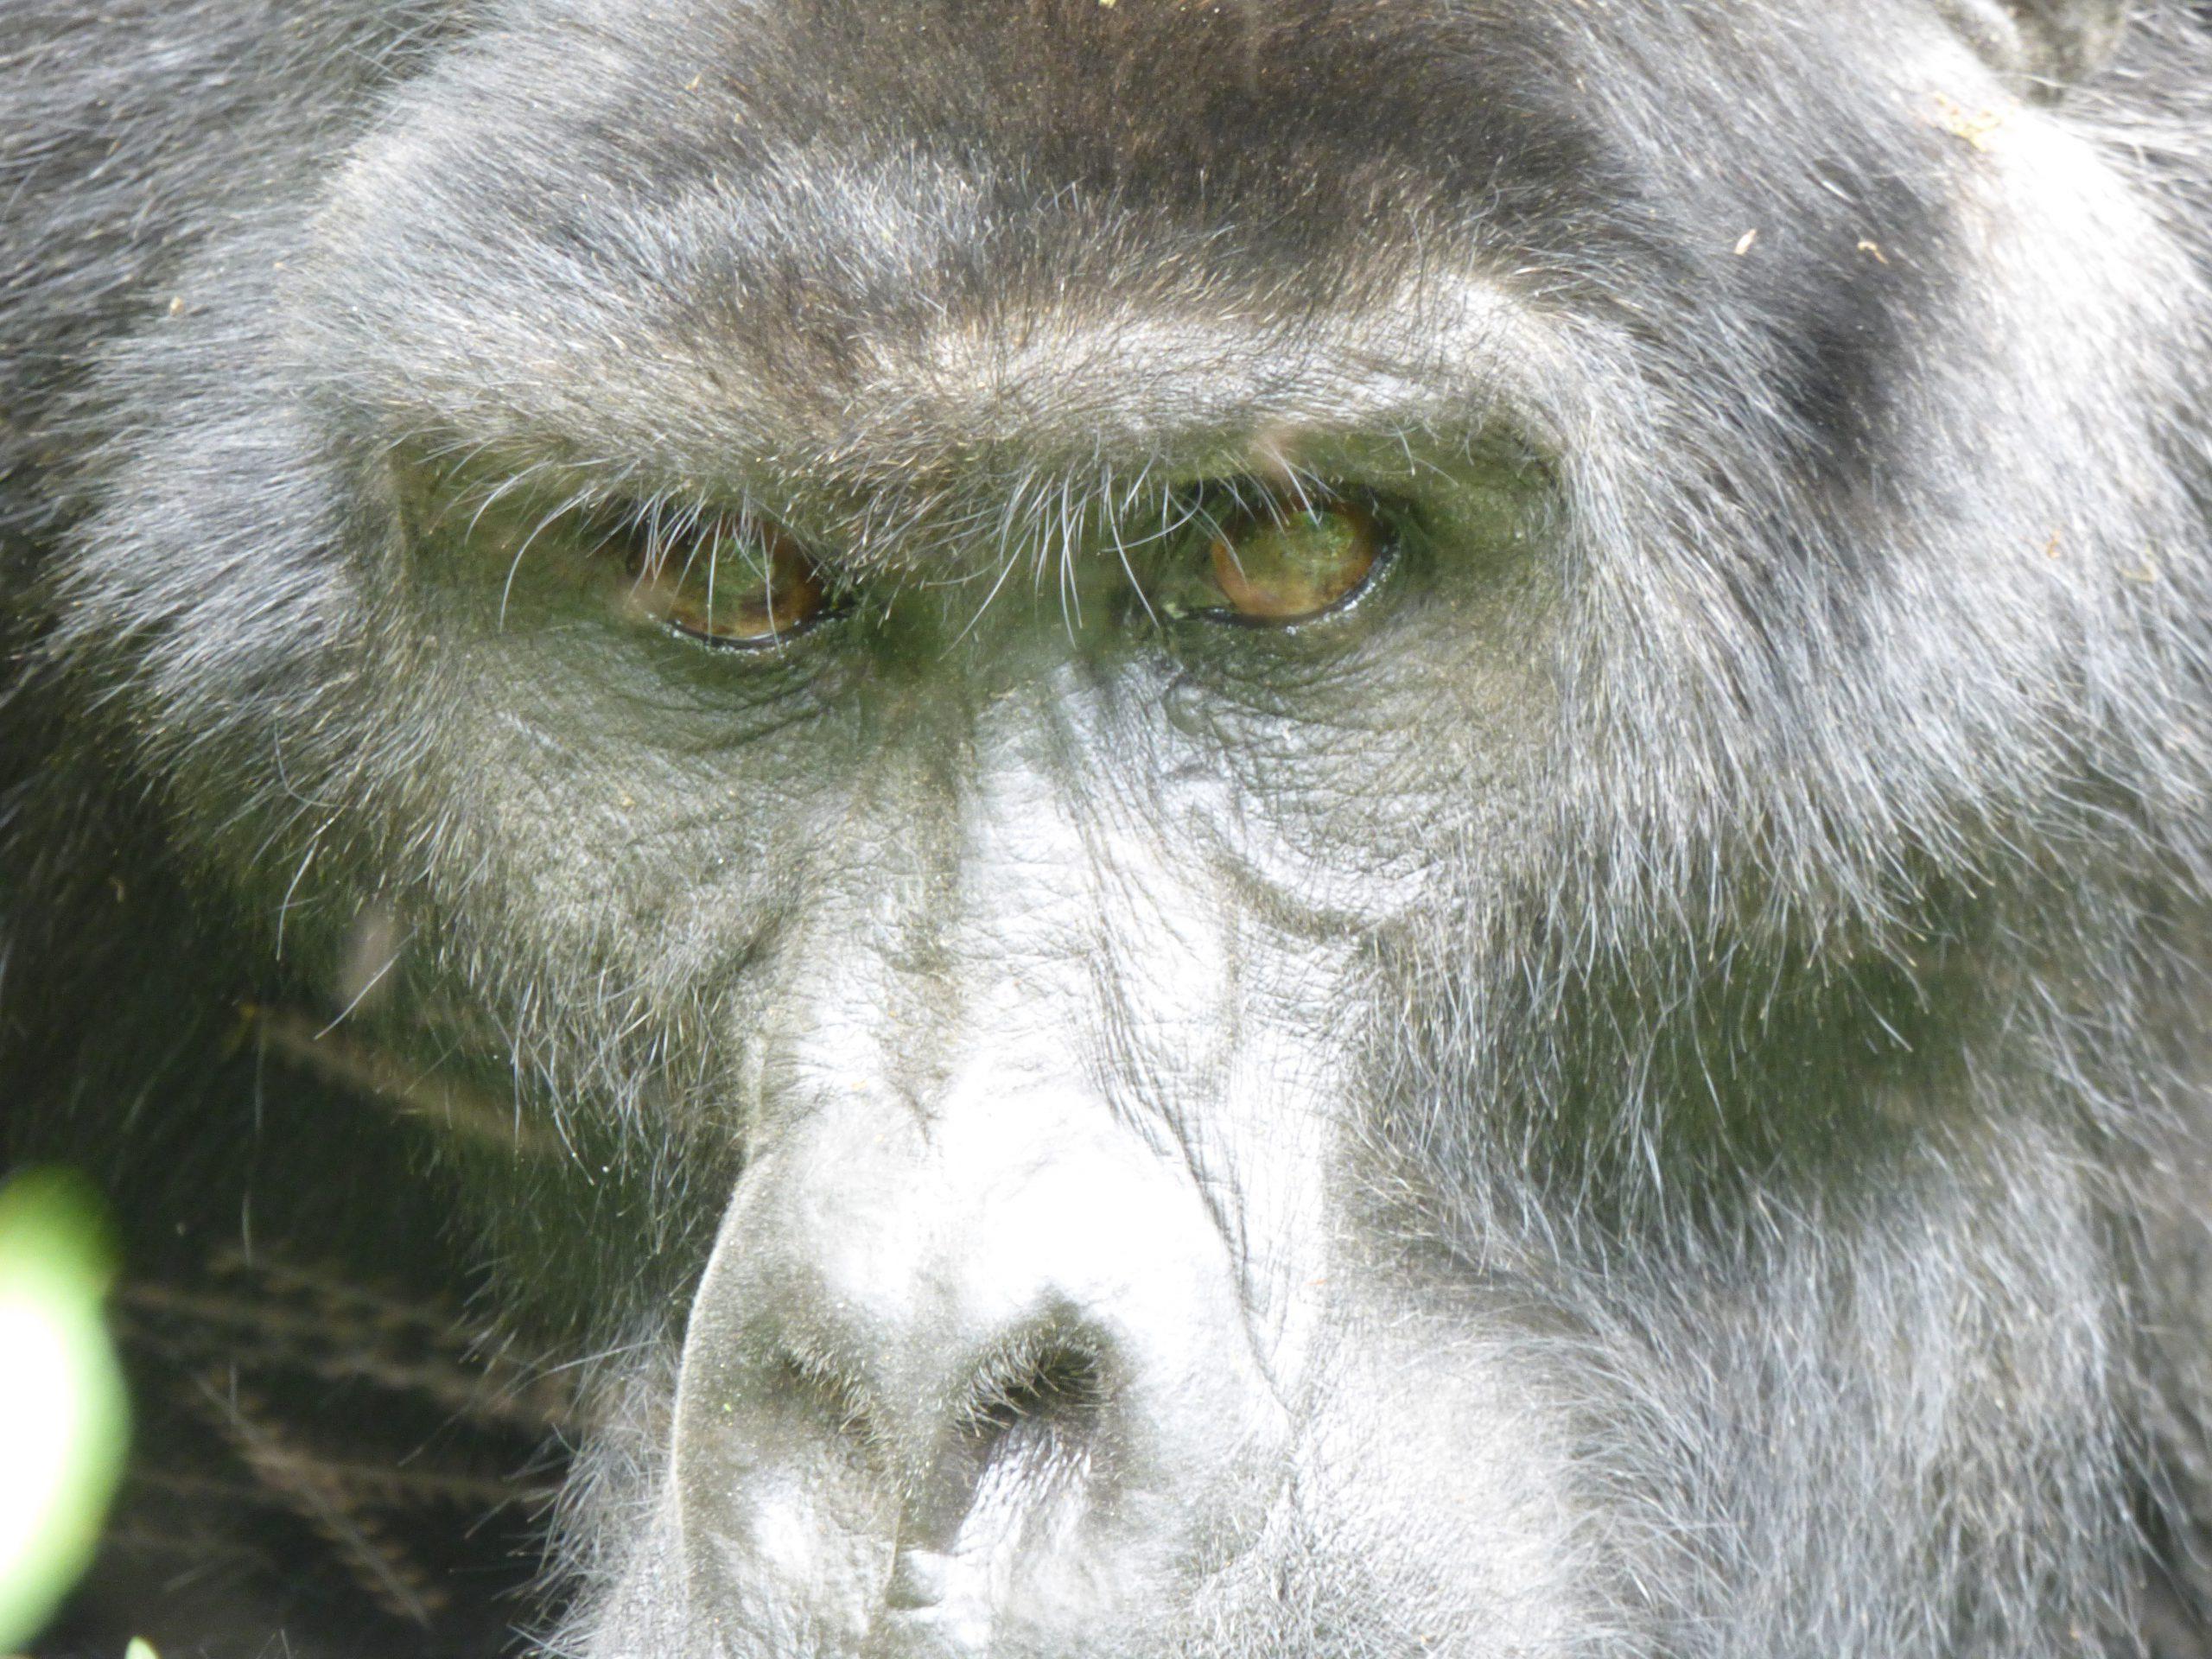 Berggorilla in Bwindi Impenetrable National Park Uganda